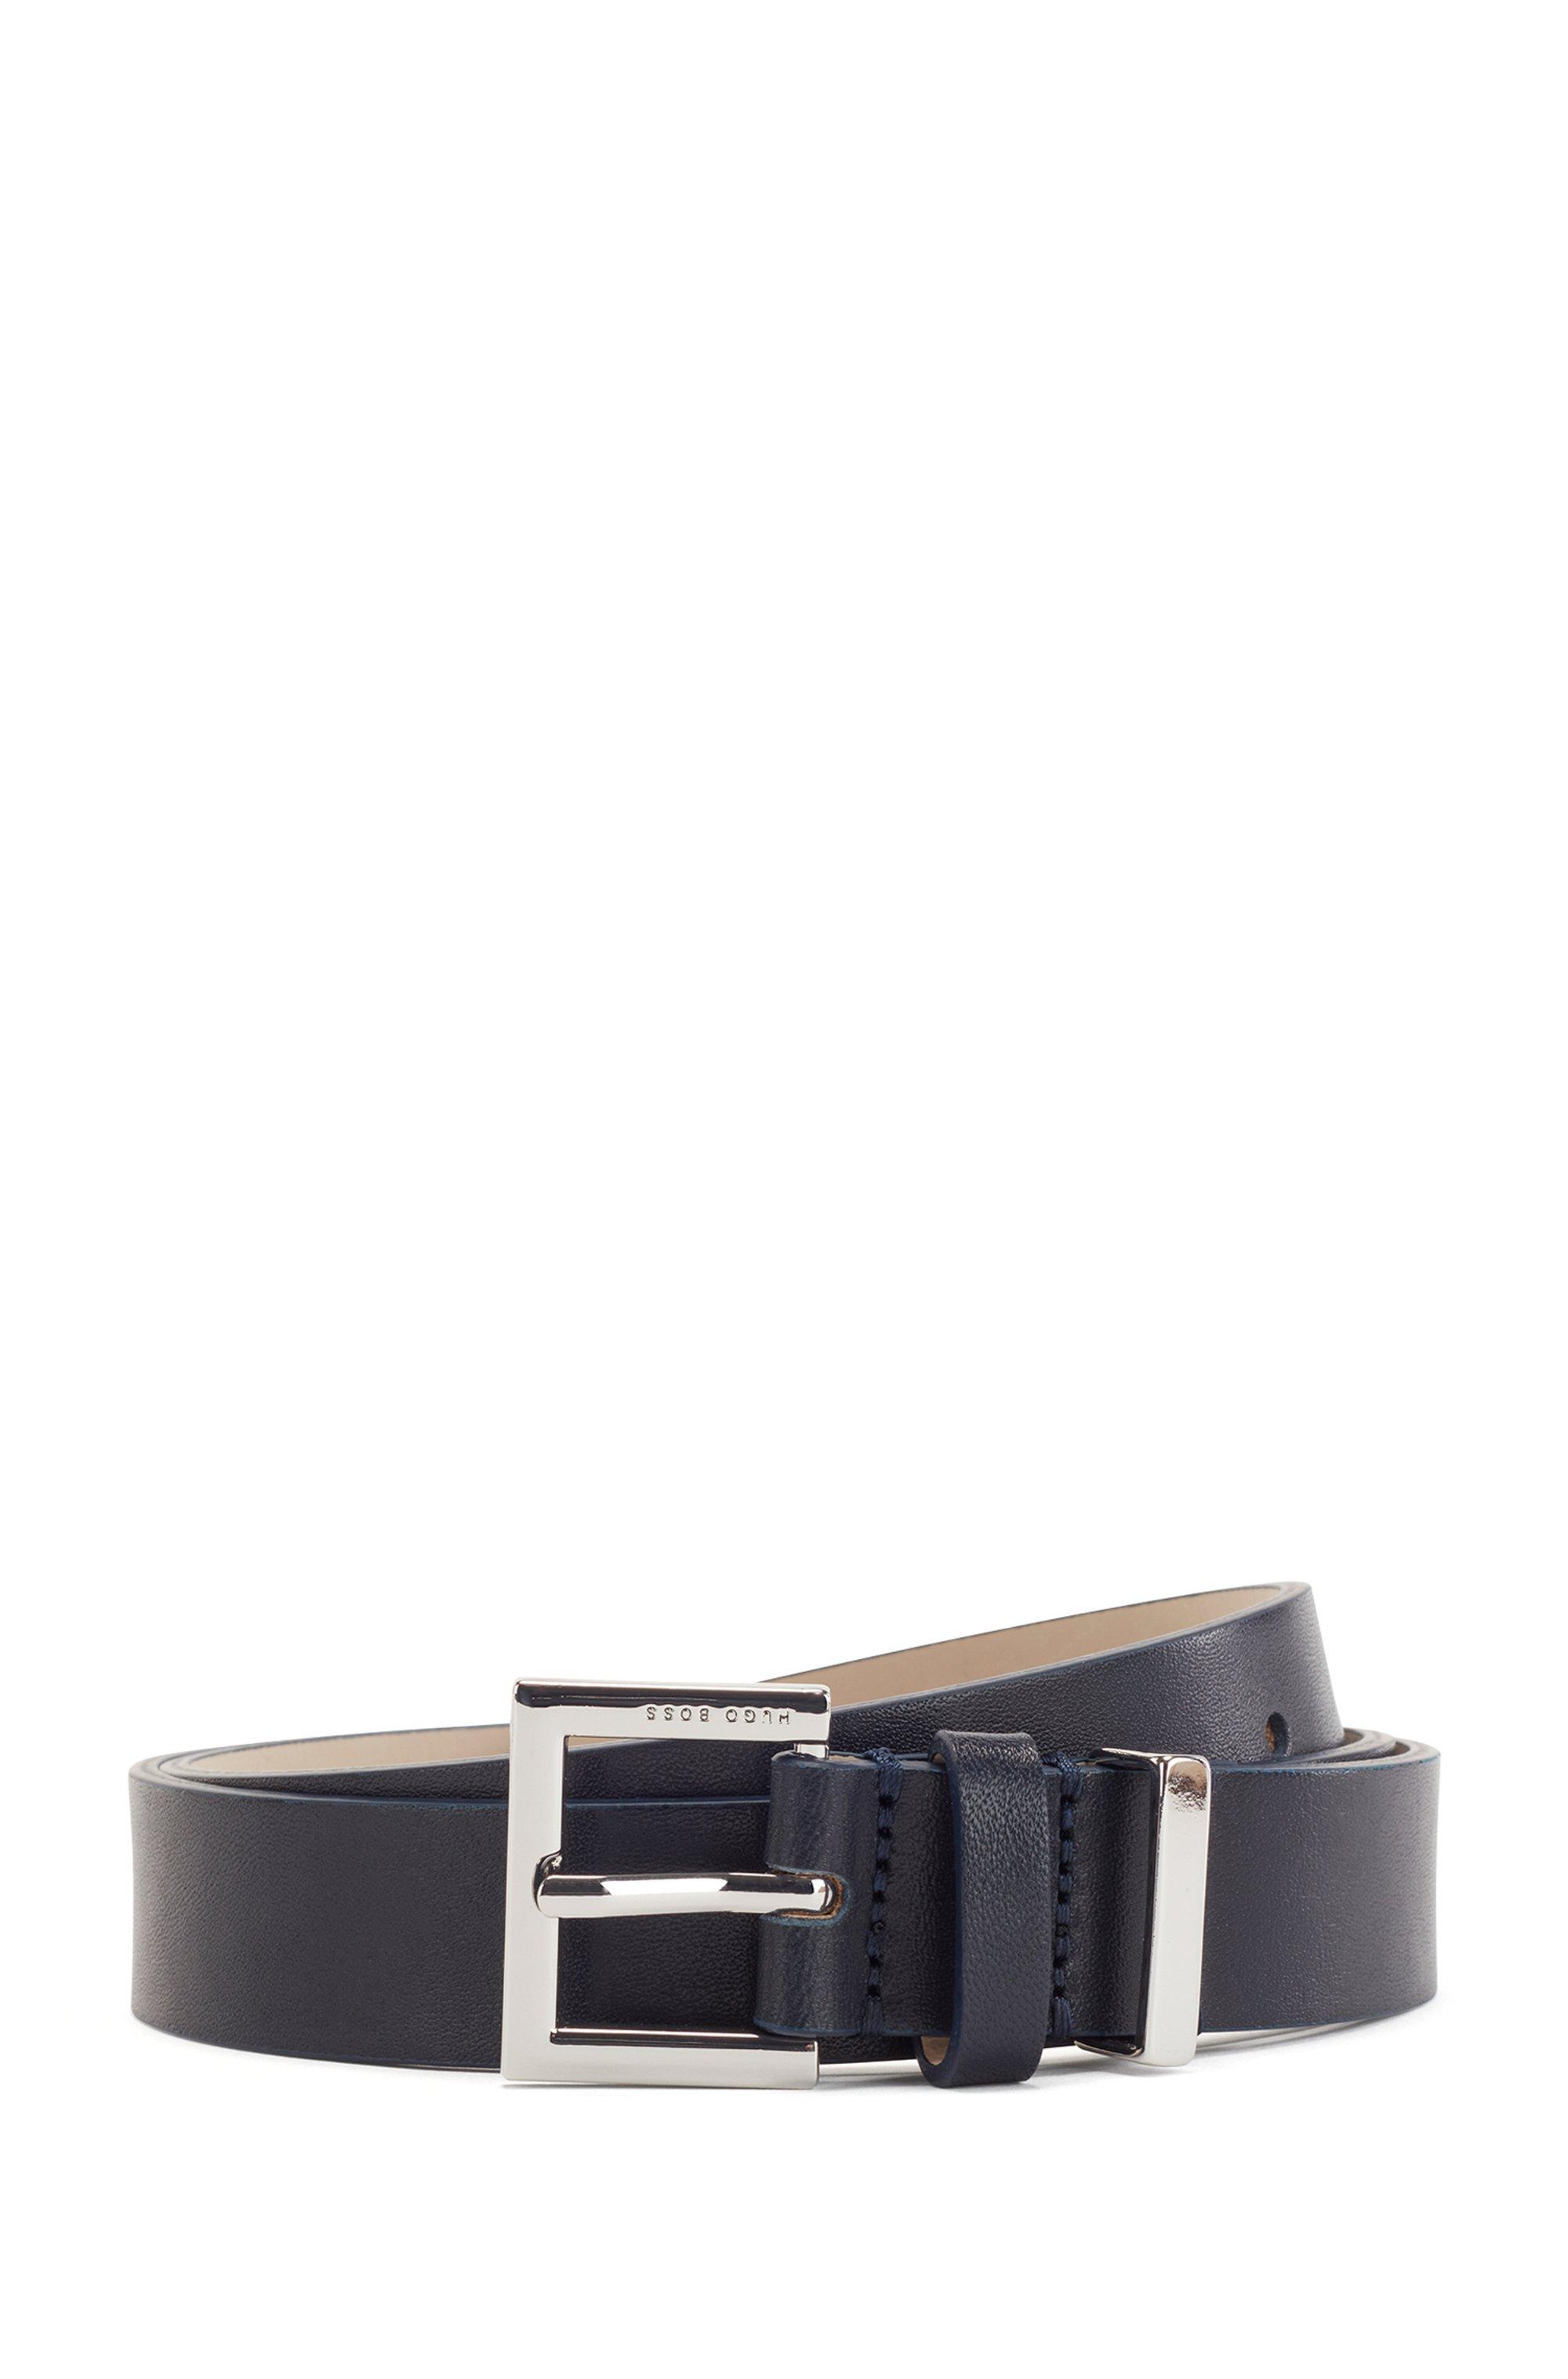 Branded-buckle belt in Italian leather with hardware detail, Dark Blue